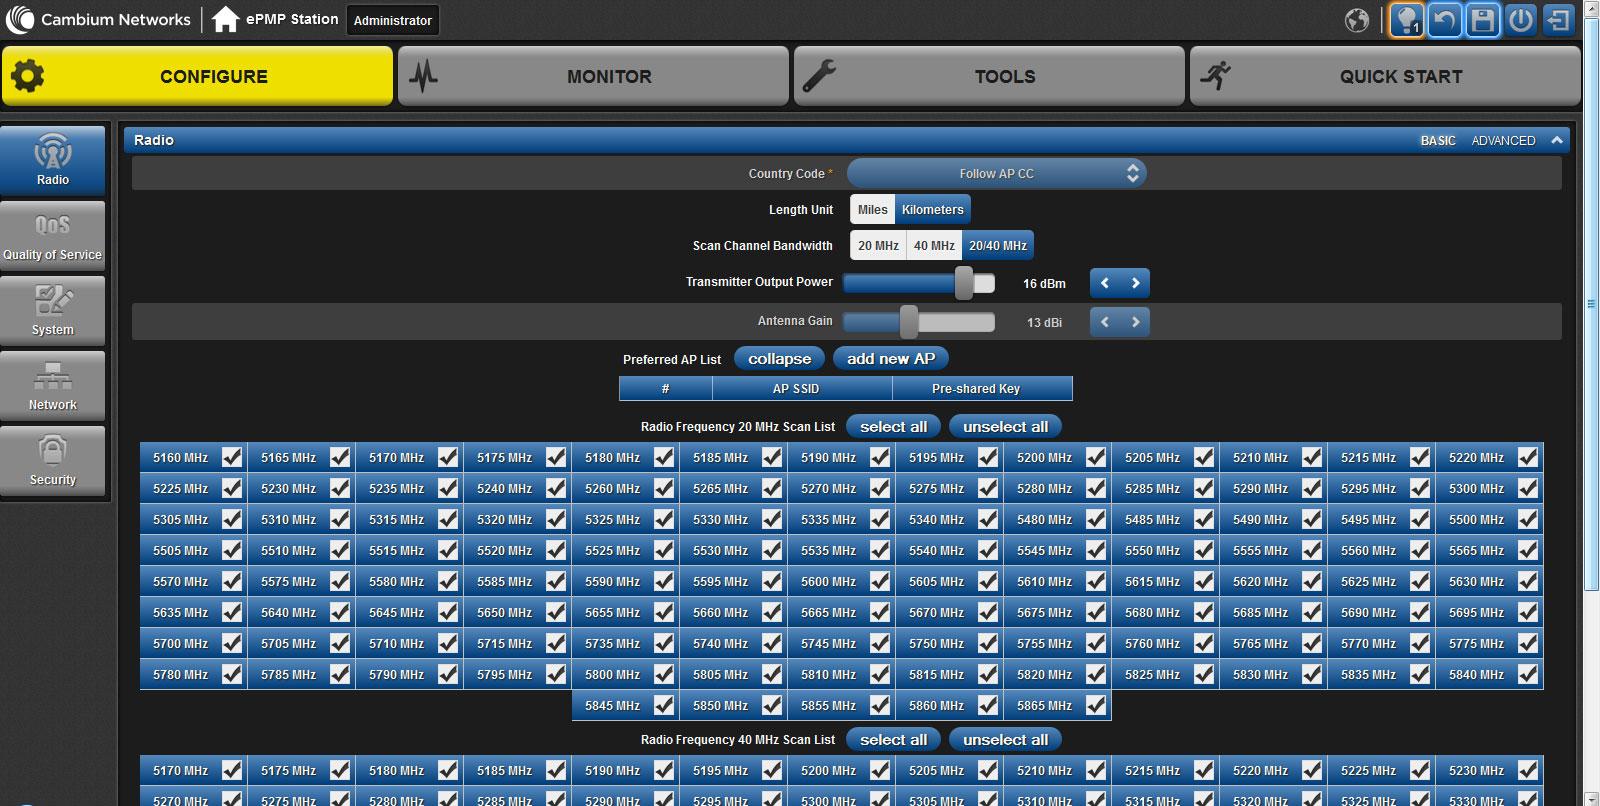 Настройки вкладки Radio web-интерфейса ePMP 1000 Integrated Radio